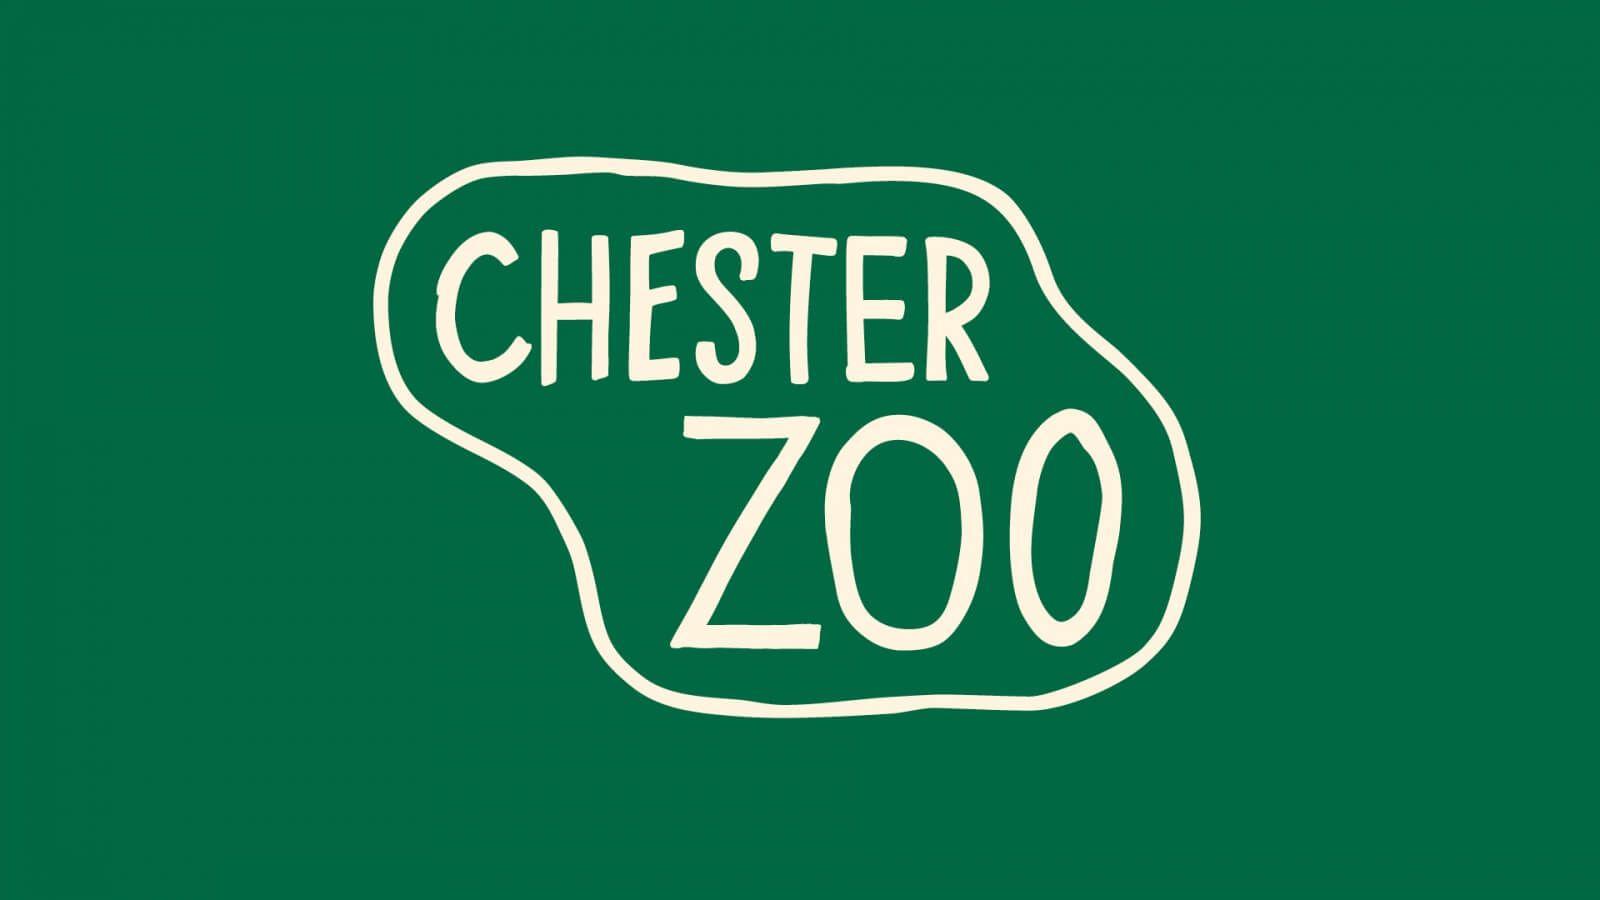 Chester Zoo Rebrand | Chester zoo, Chester, Zoo logo